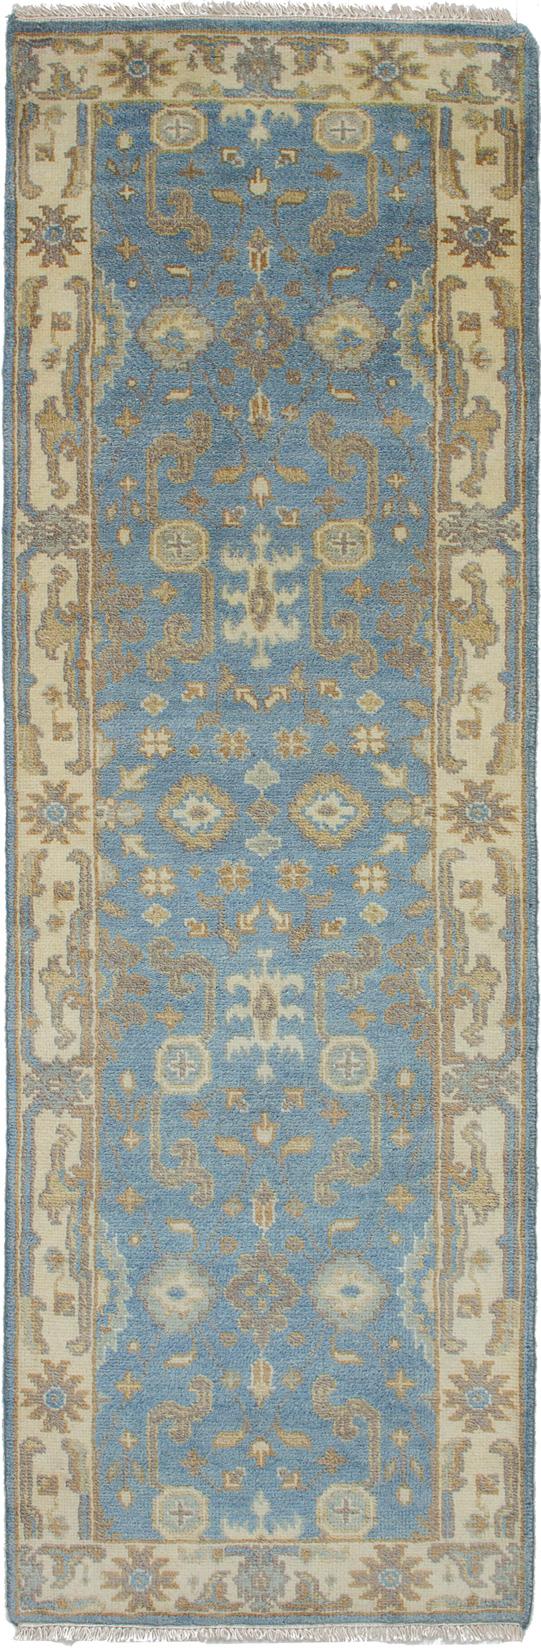 "Hand-knotted Royal Ushak Sky Blue Wool Rug 2'7"" x 7'11""  Size: 2'7"" x 7'11"""